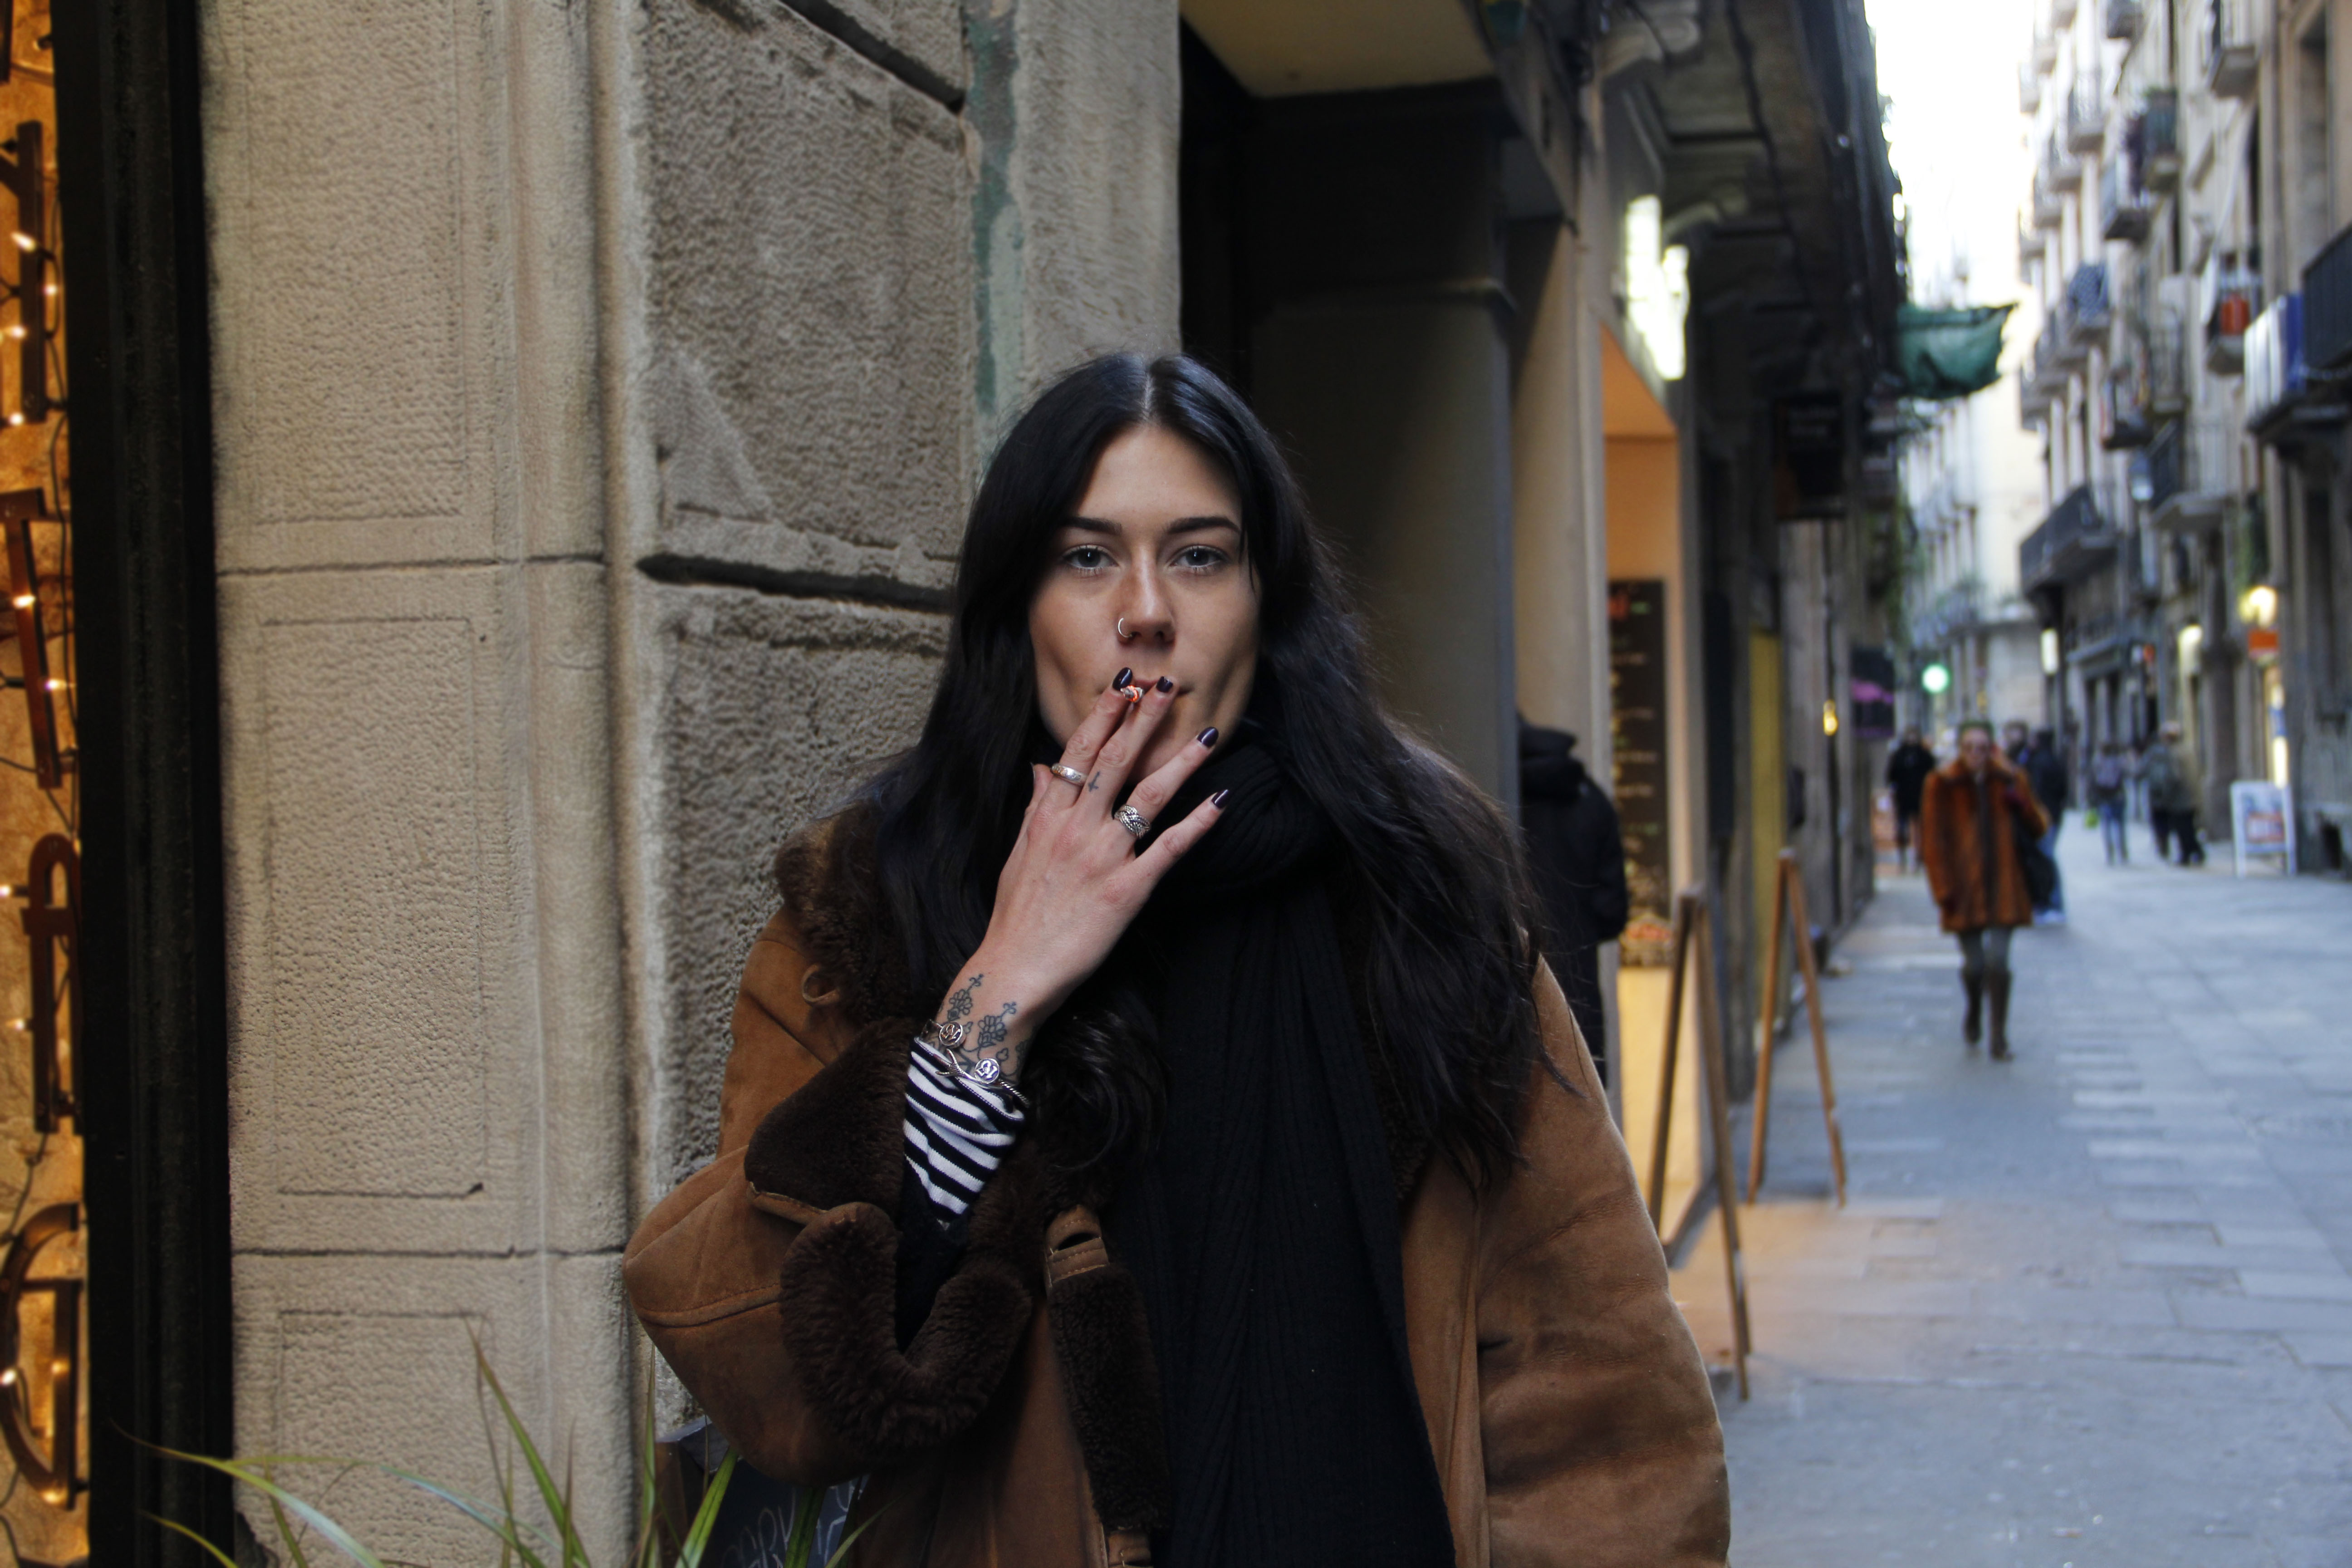 streetstyle-adrianamars-barcelona-2017-10